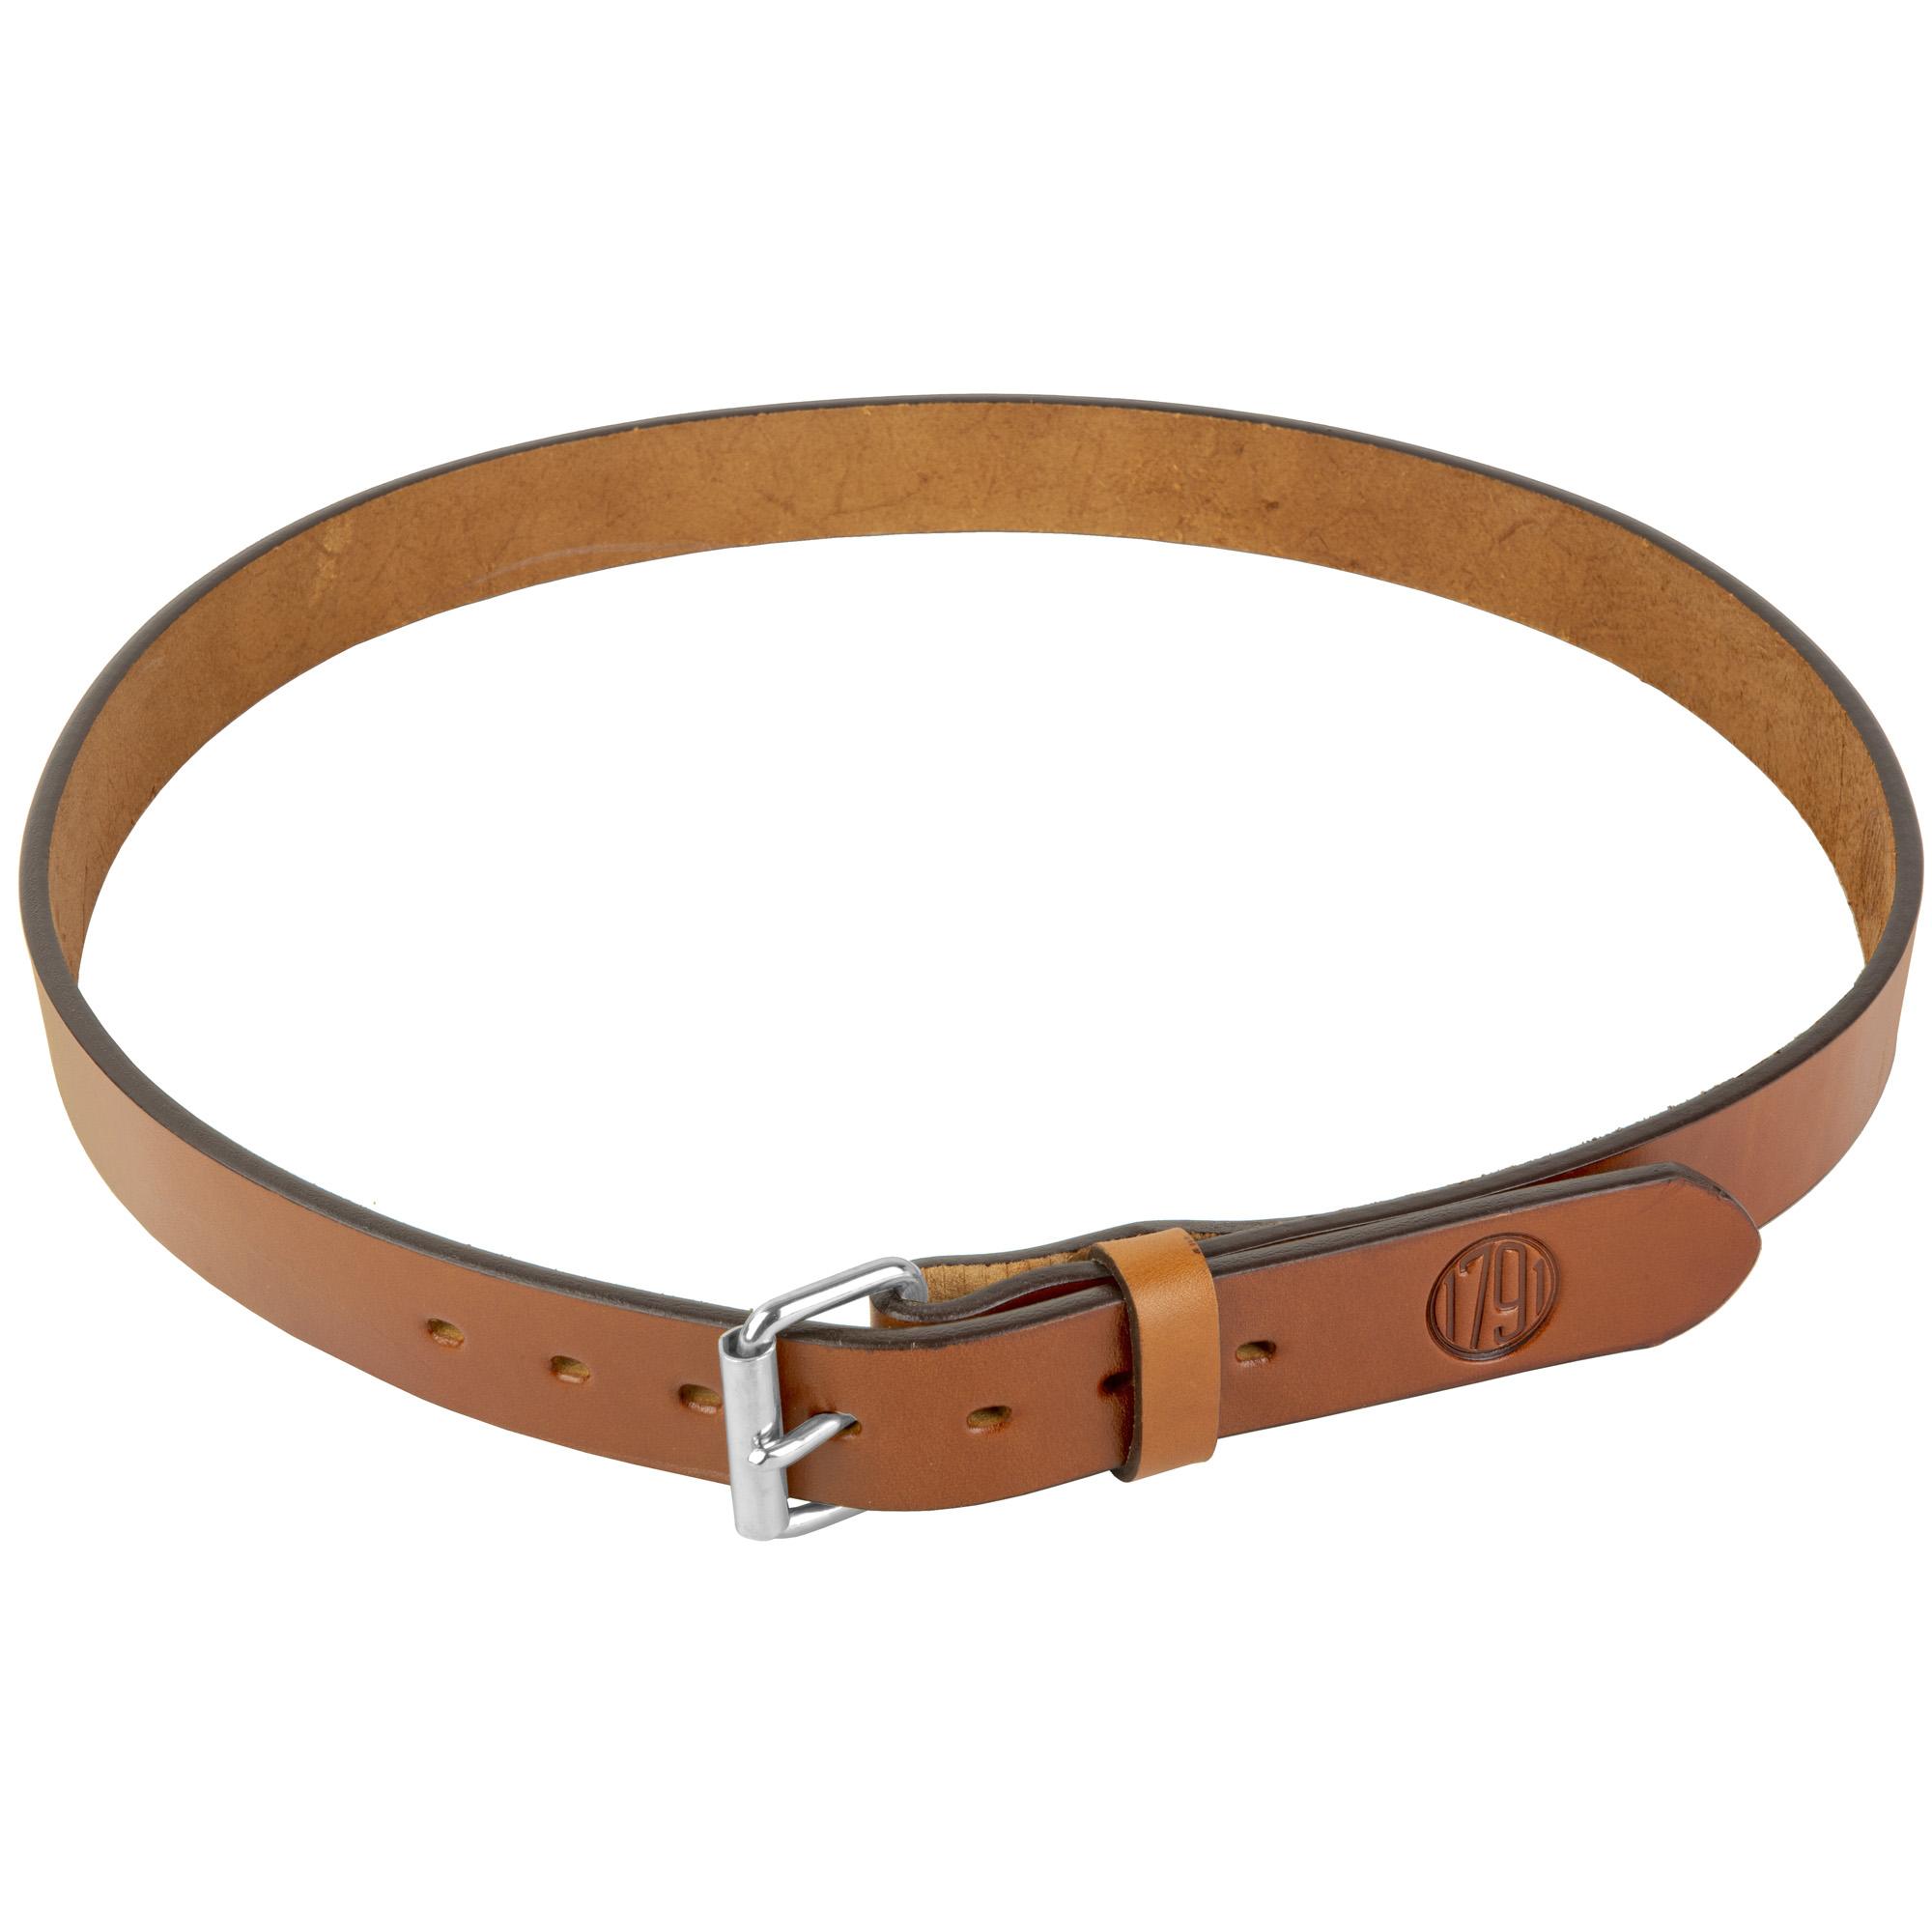 1791 Belt 01 Classic Brown Sz 42/46